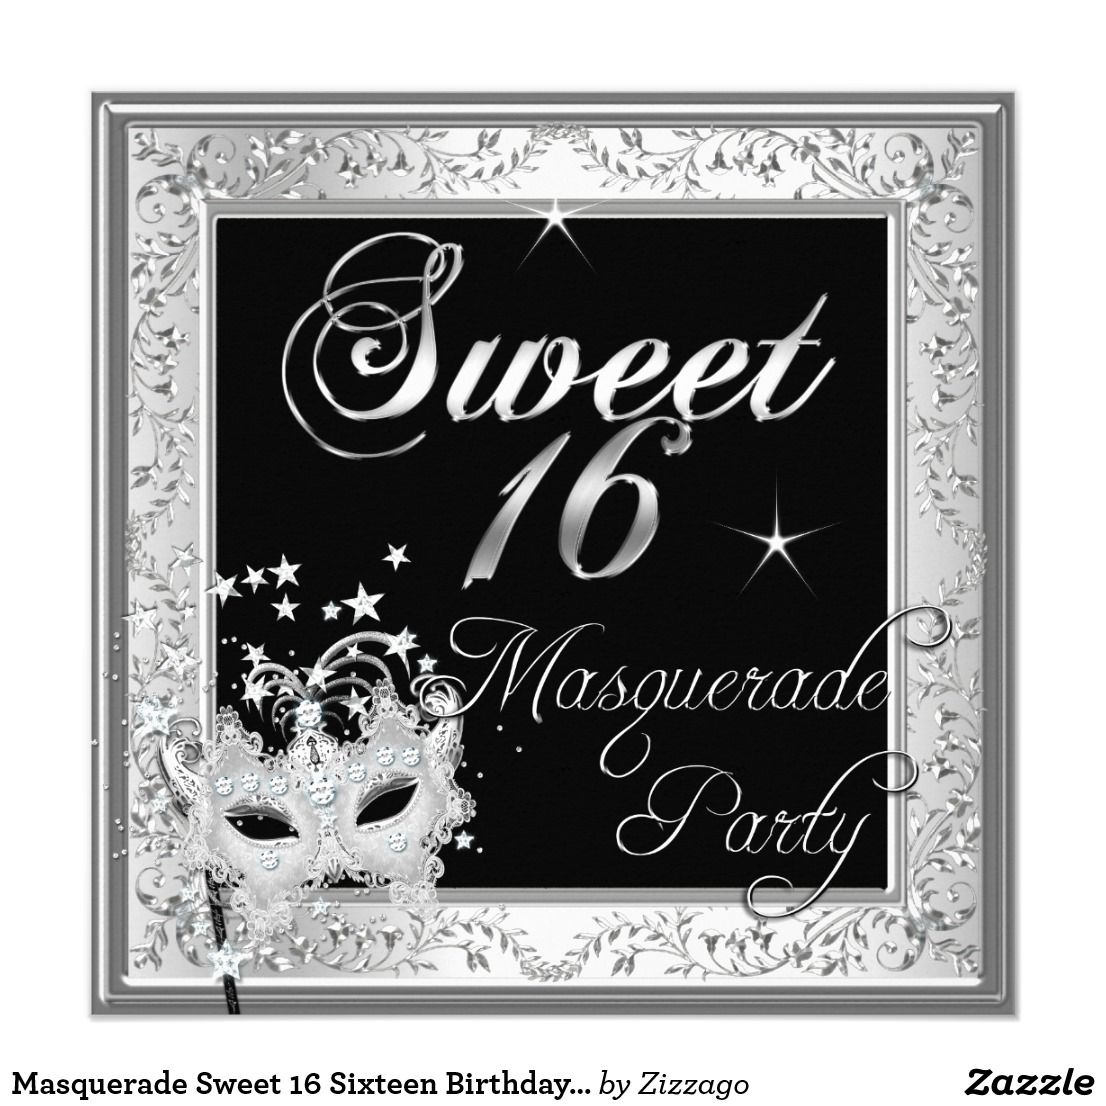 Masquerade Sweet 16 Sixteen Birthday Black White Card | Sixteenth ...